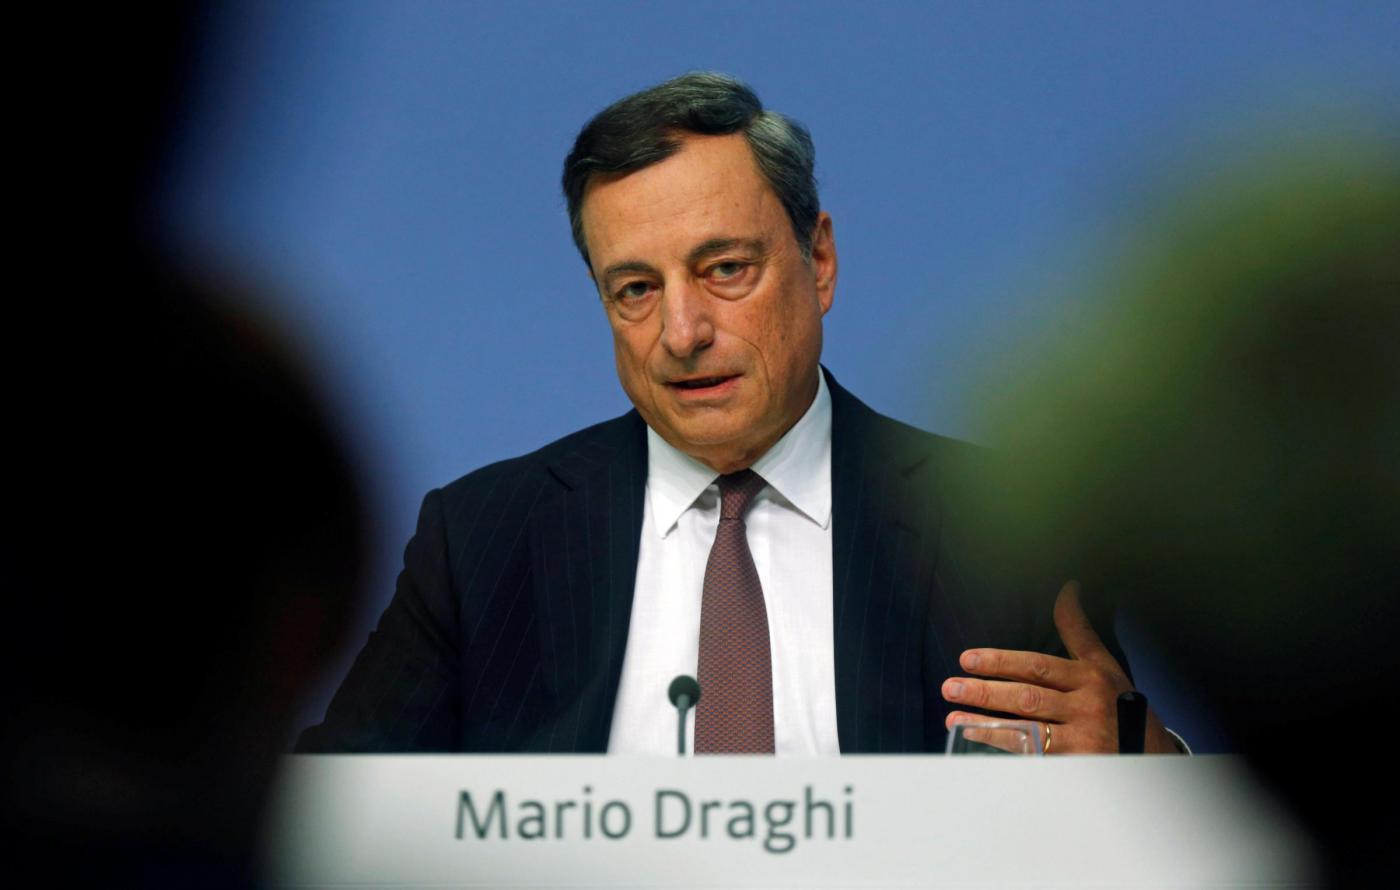 Francoforte, la conferenza stampa del presidente della BCE Mario Draghi